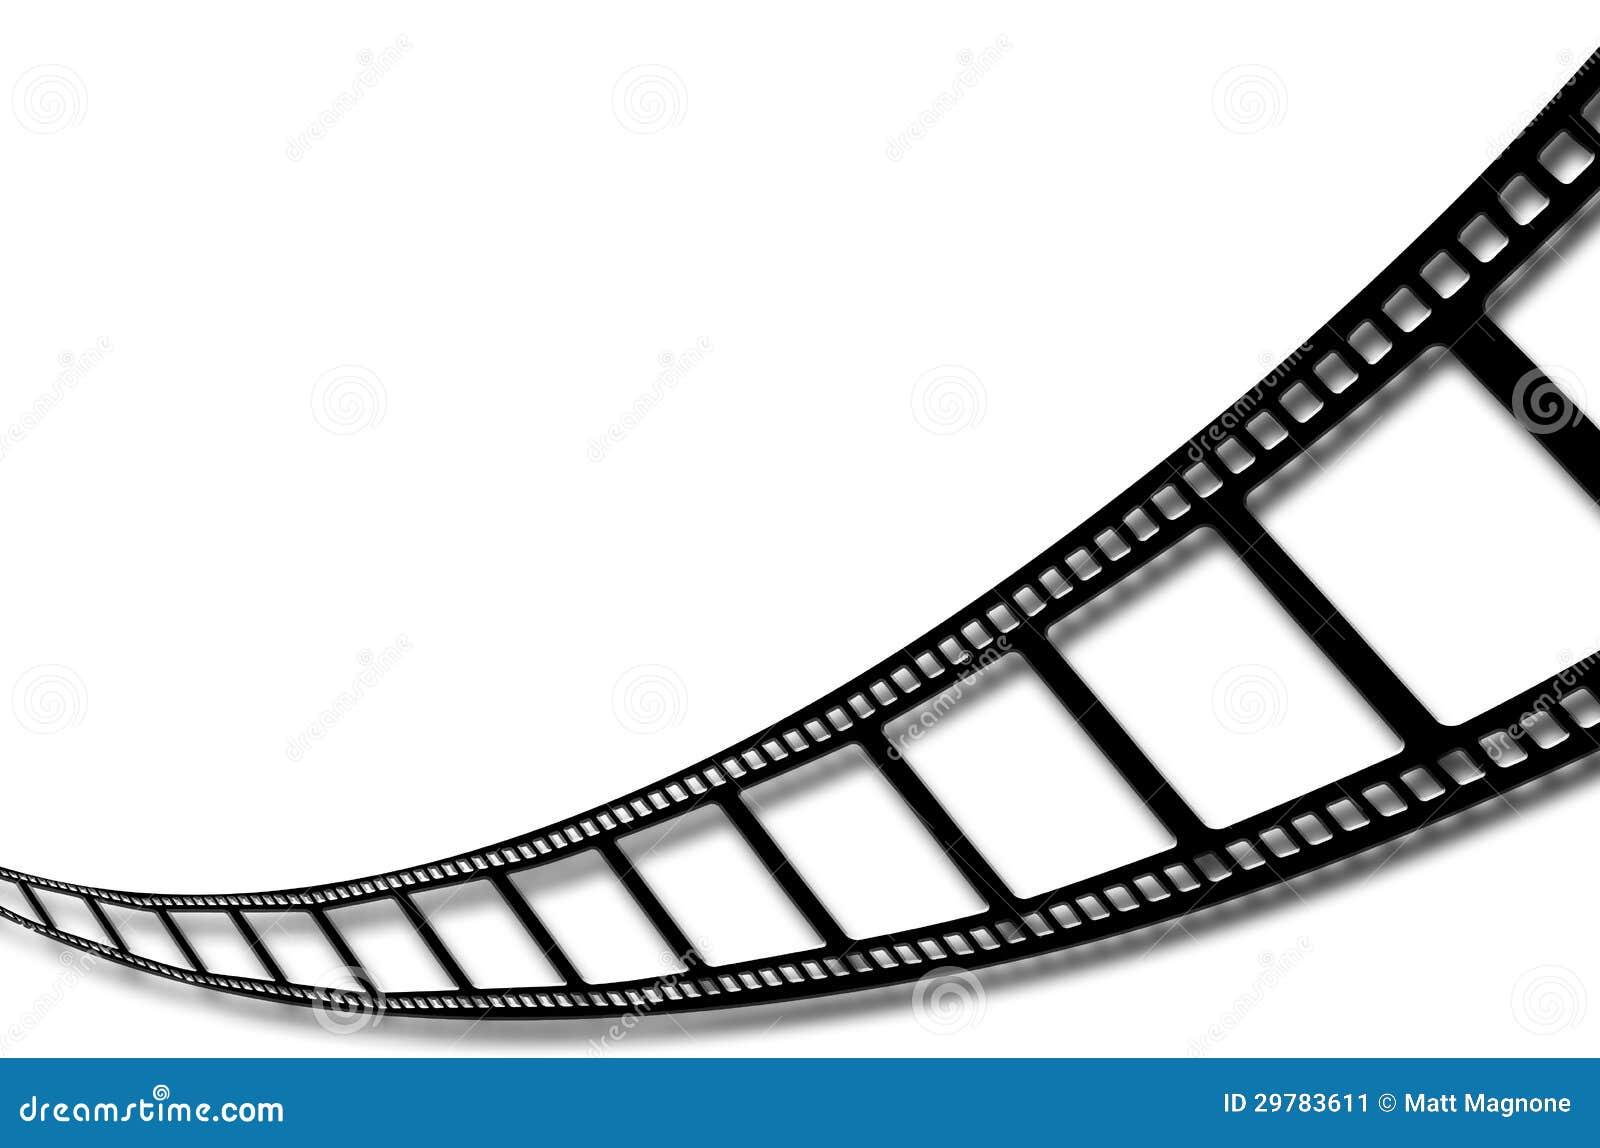 Filma remsan